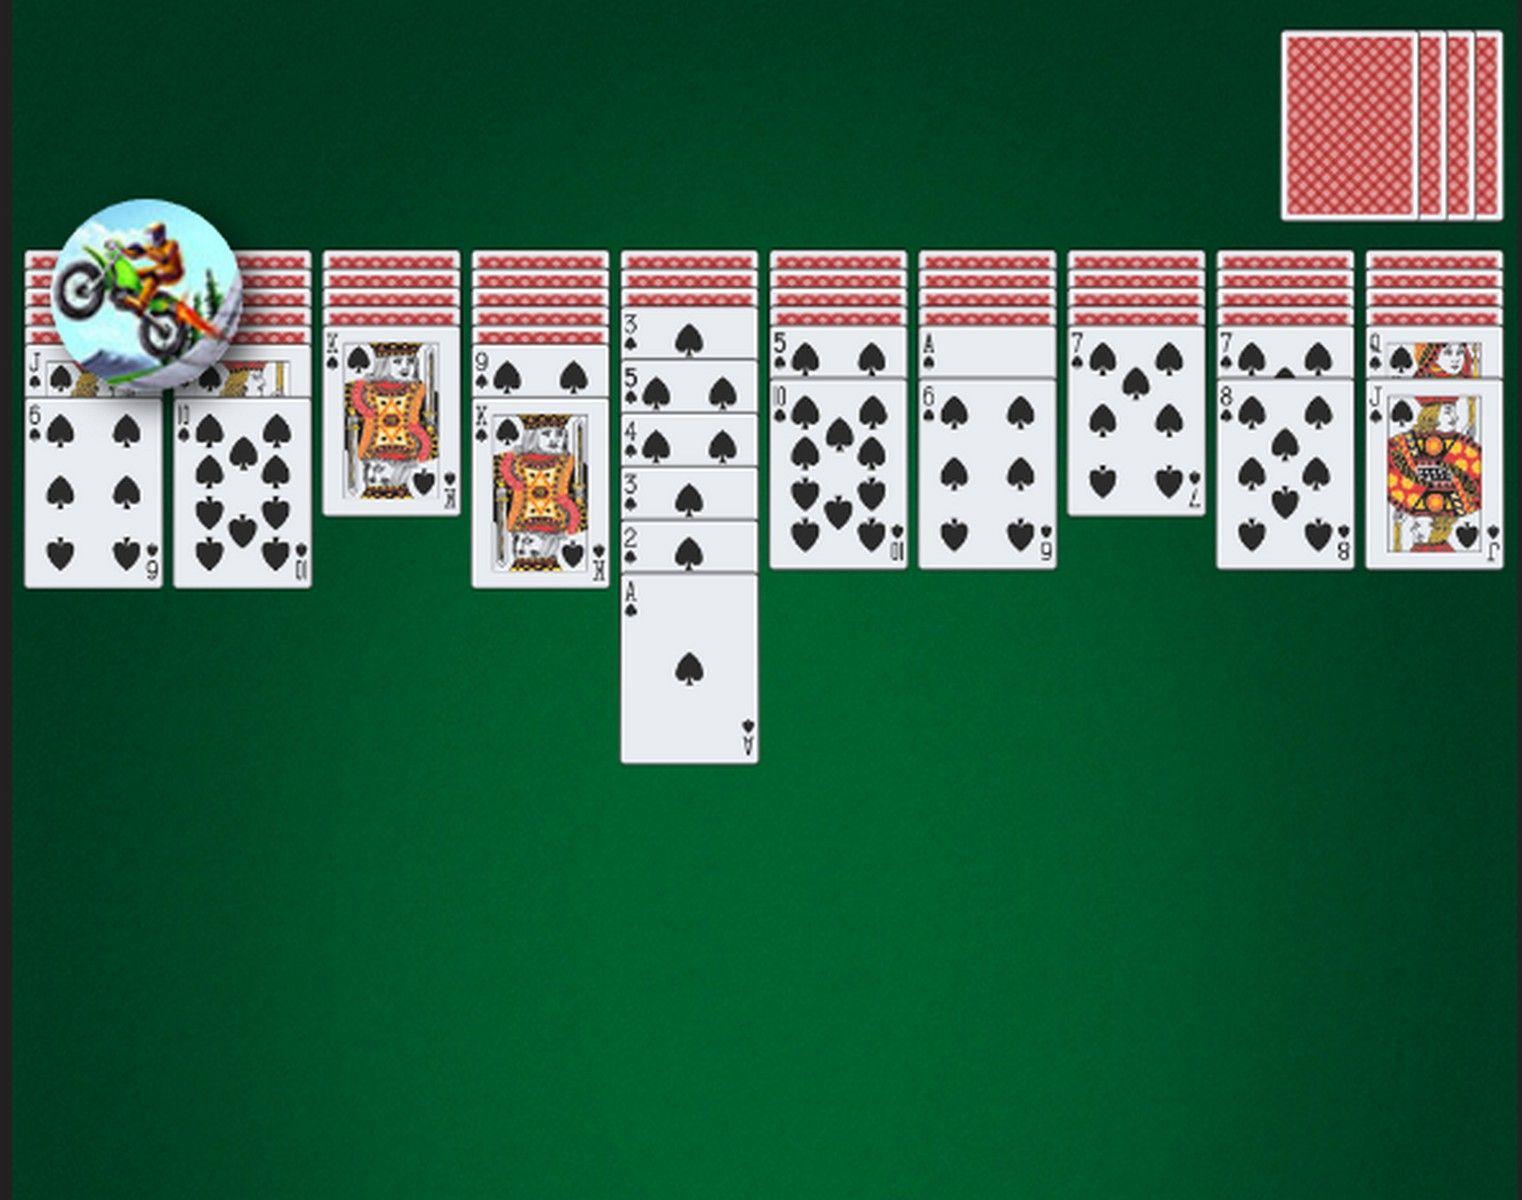 Spider Solitaire Spider solitaire, Gamesroom, Classic games